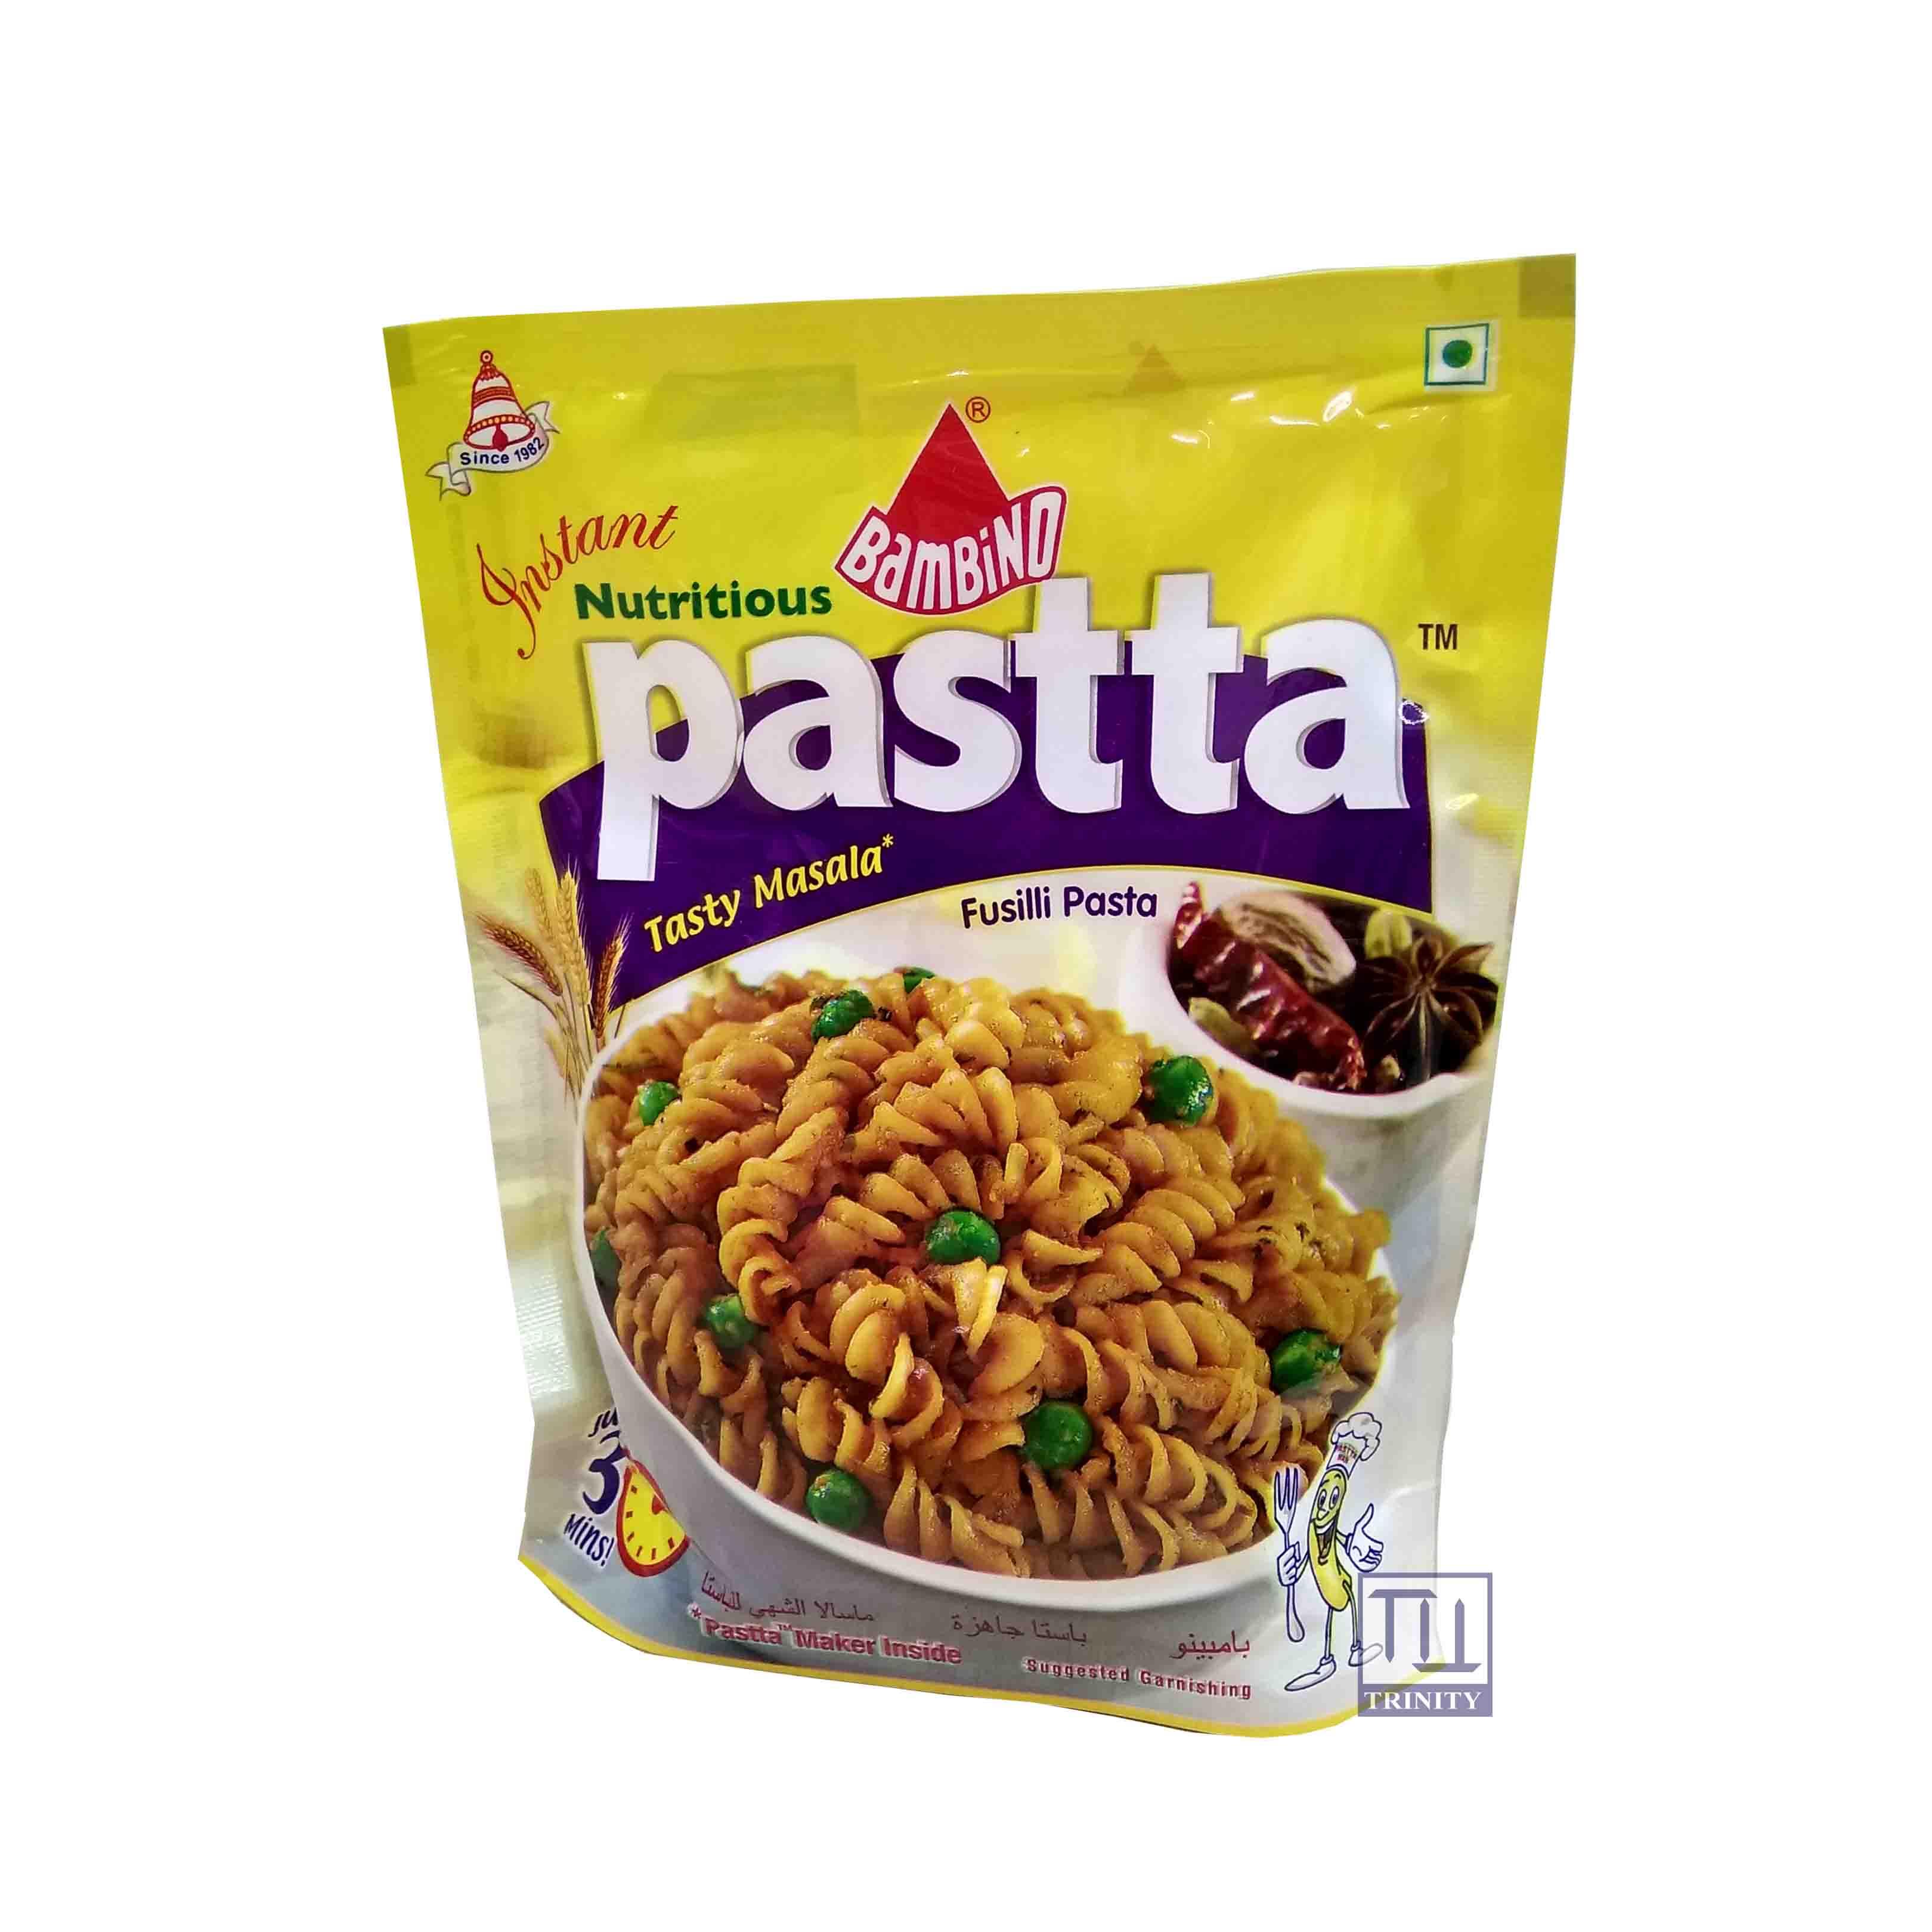 Bambino Instant Pasta Masala Flavour 印度巴比諾即時調理粉 (香料口味)